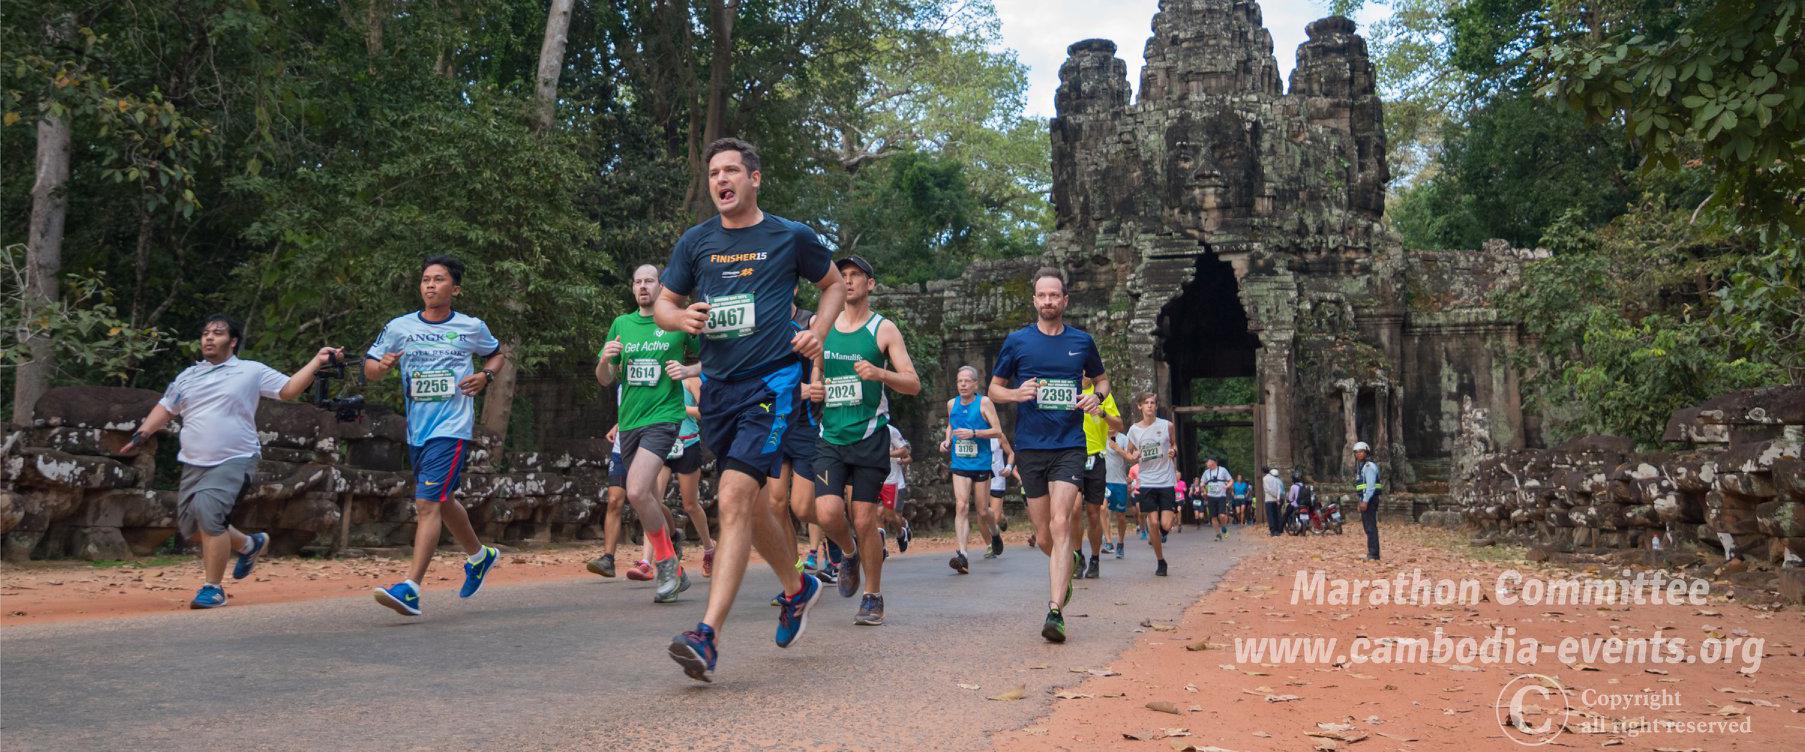 angkorwathalfmarathon2018